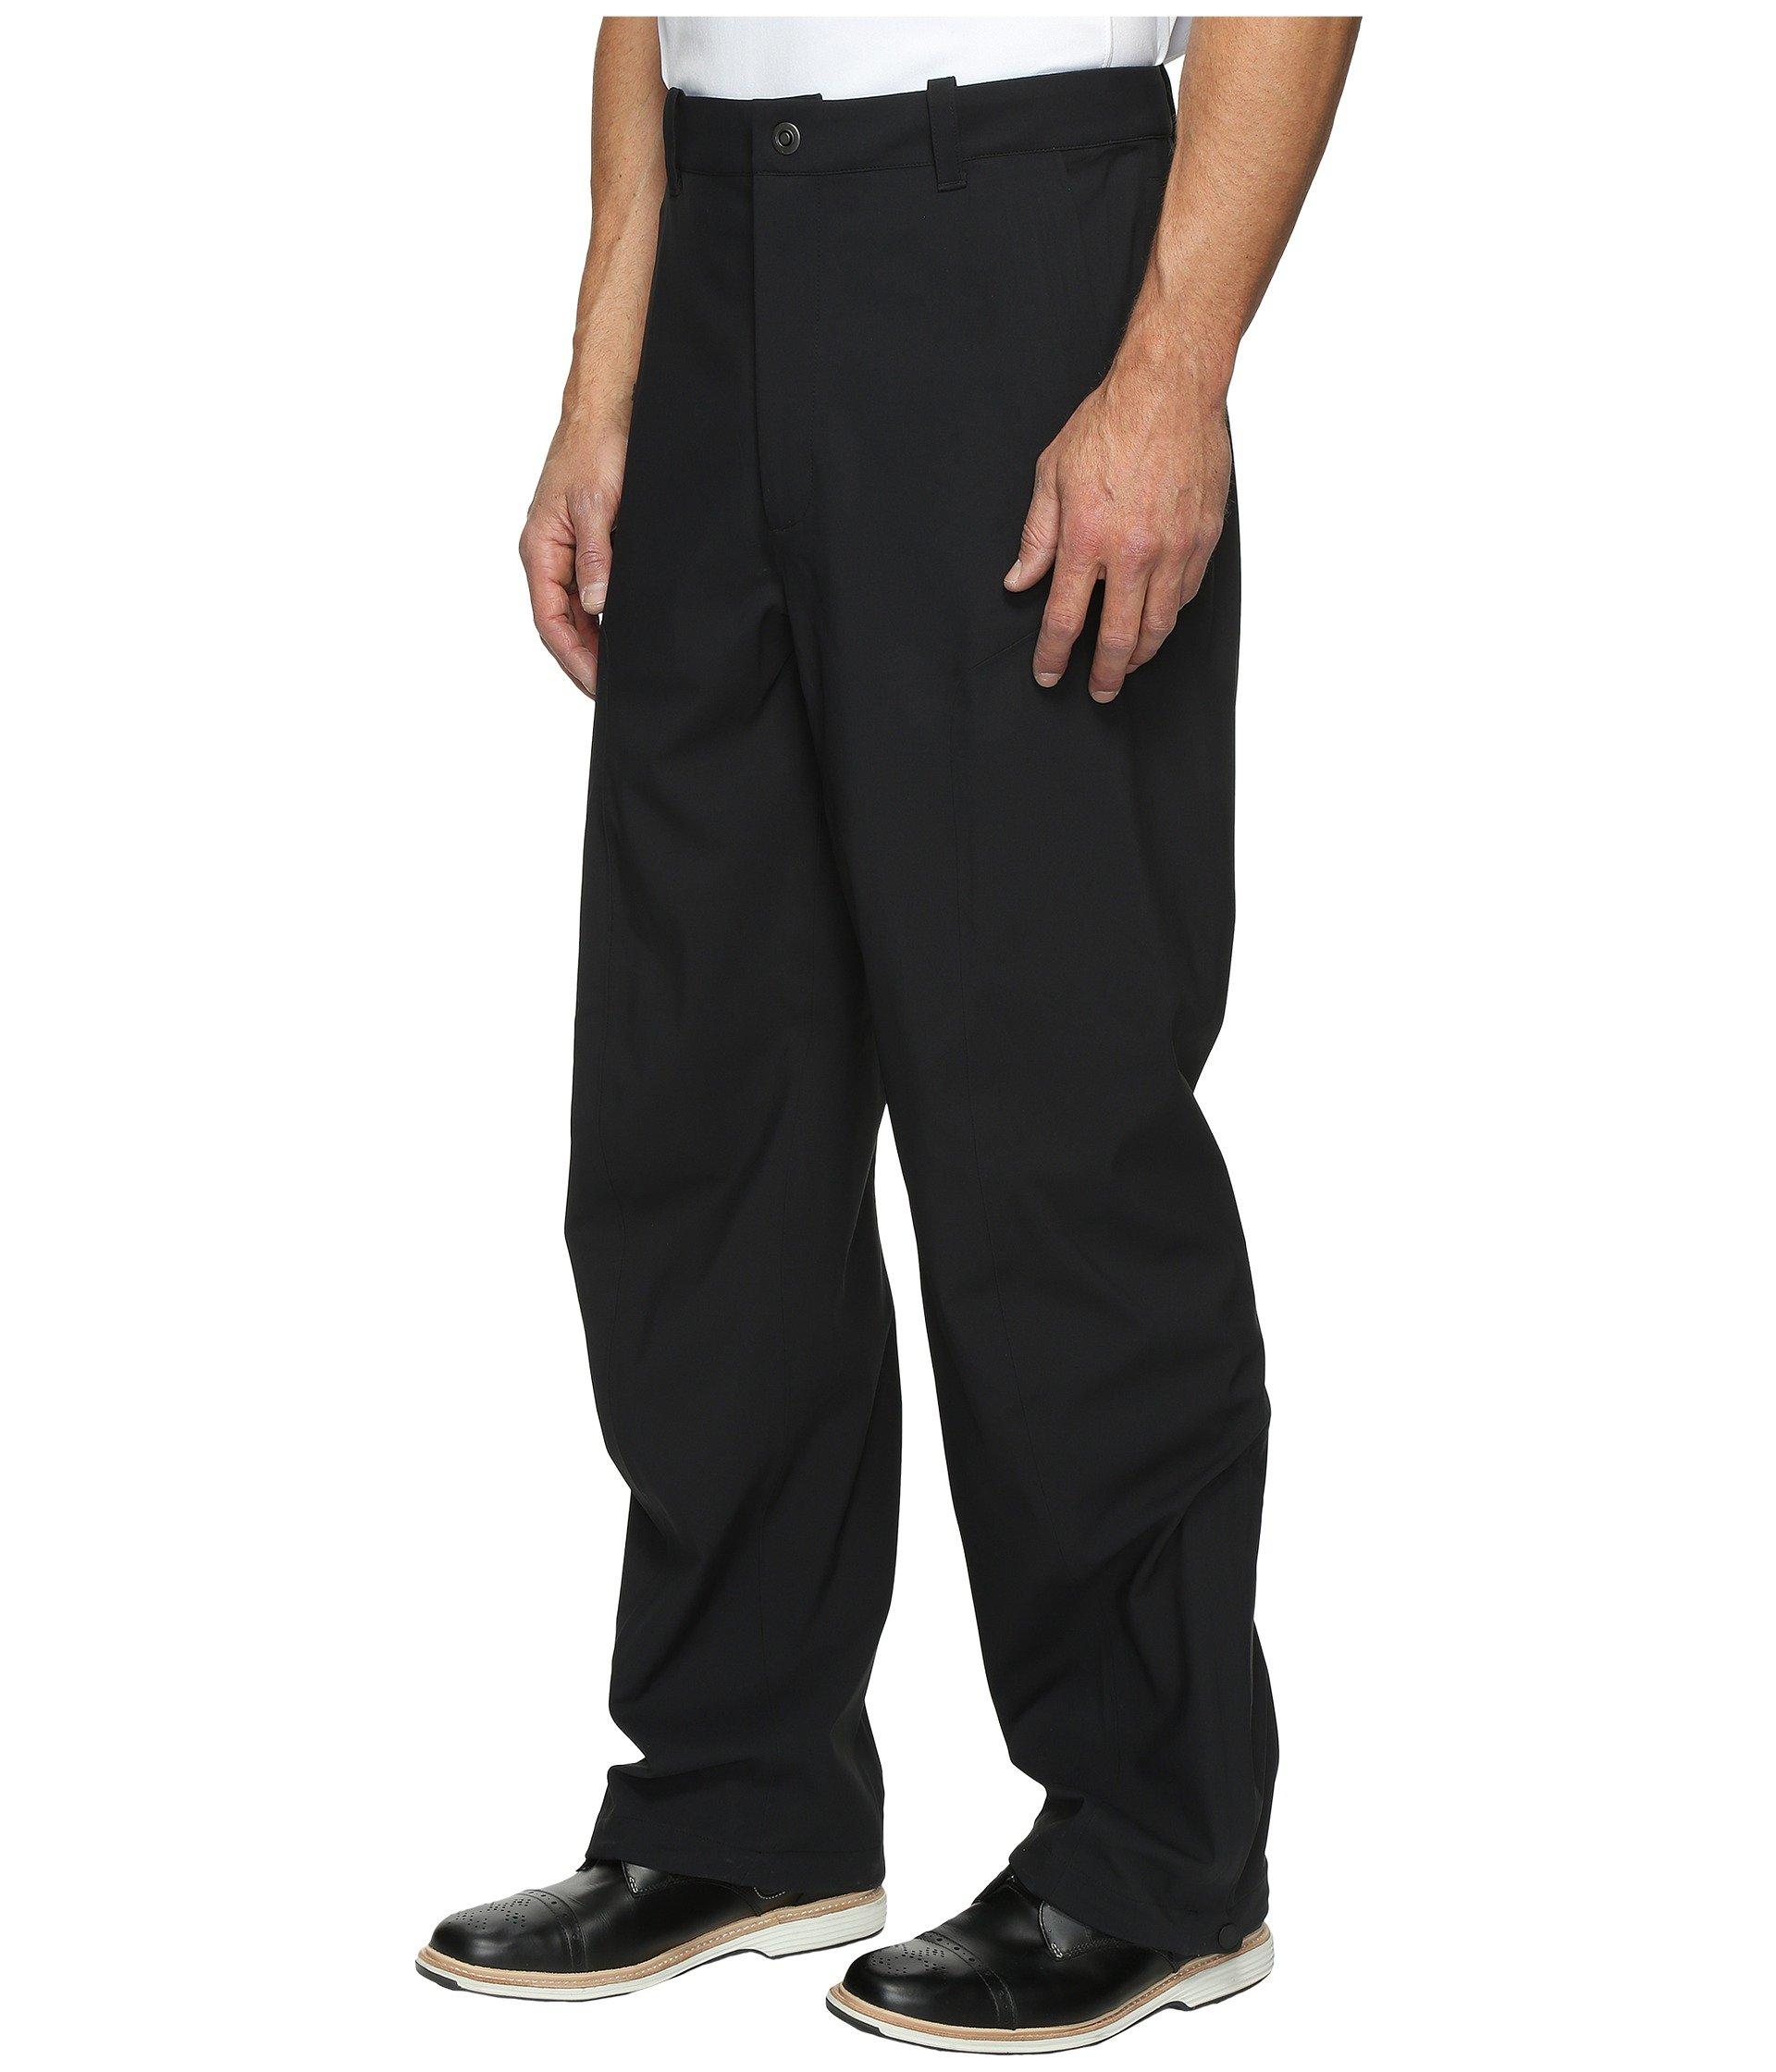 Nike Men's Hyper Storm-FIT Golf Pants by Nike Golf (Image #2)